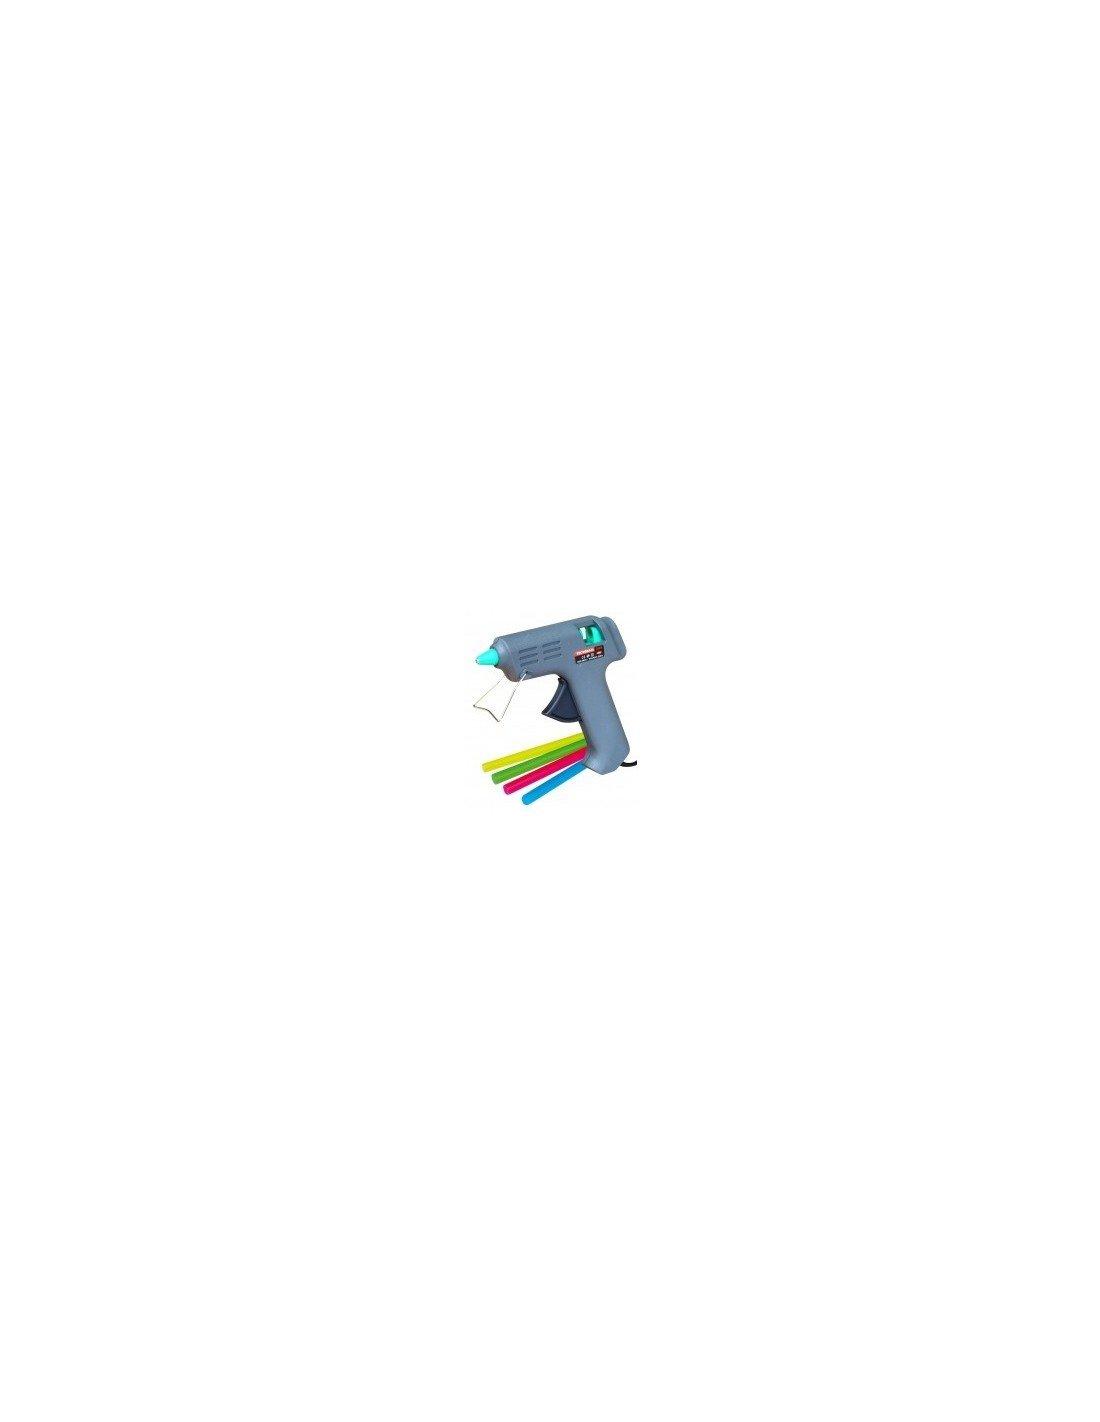 Maxicraft 01264 Lot de 20 Batons de Colle universelle Fluorescente